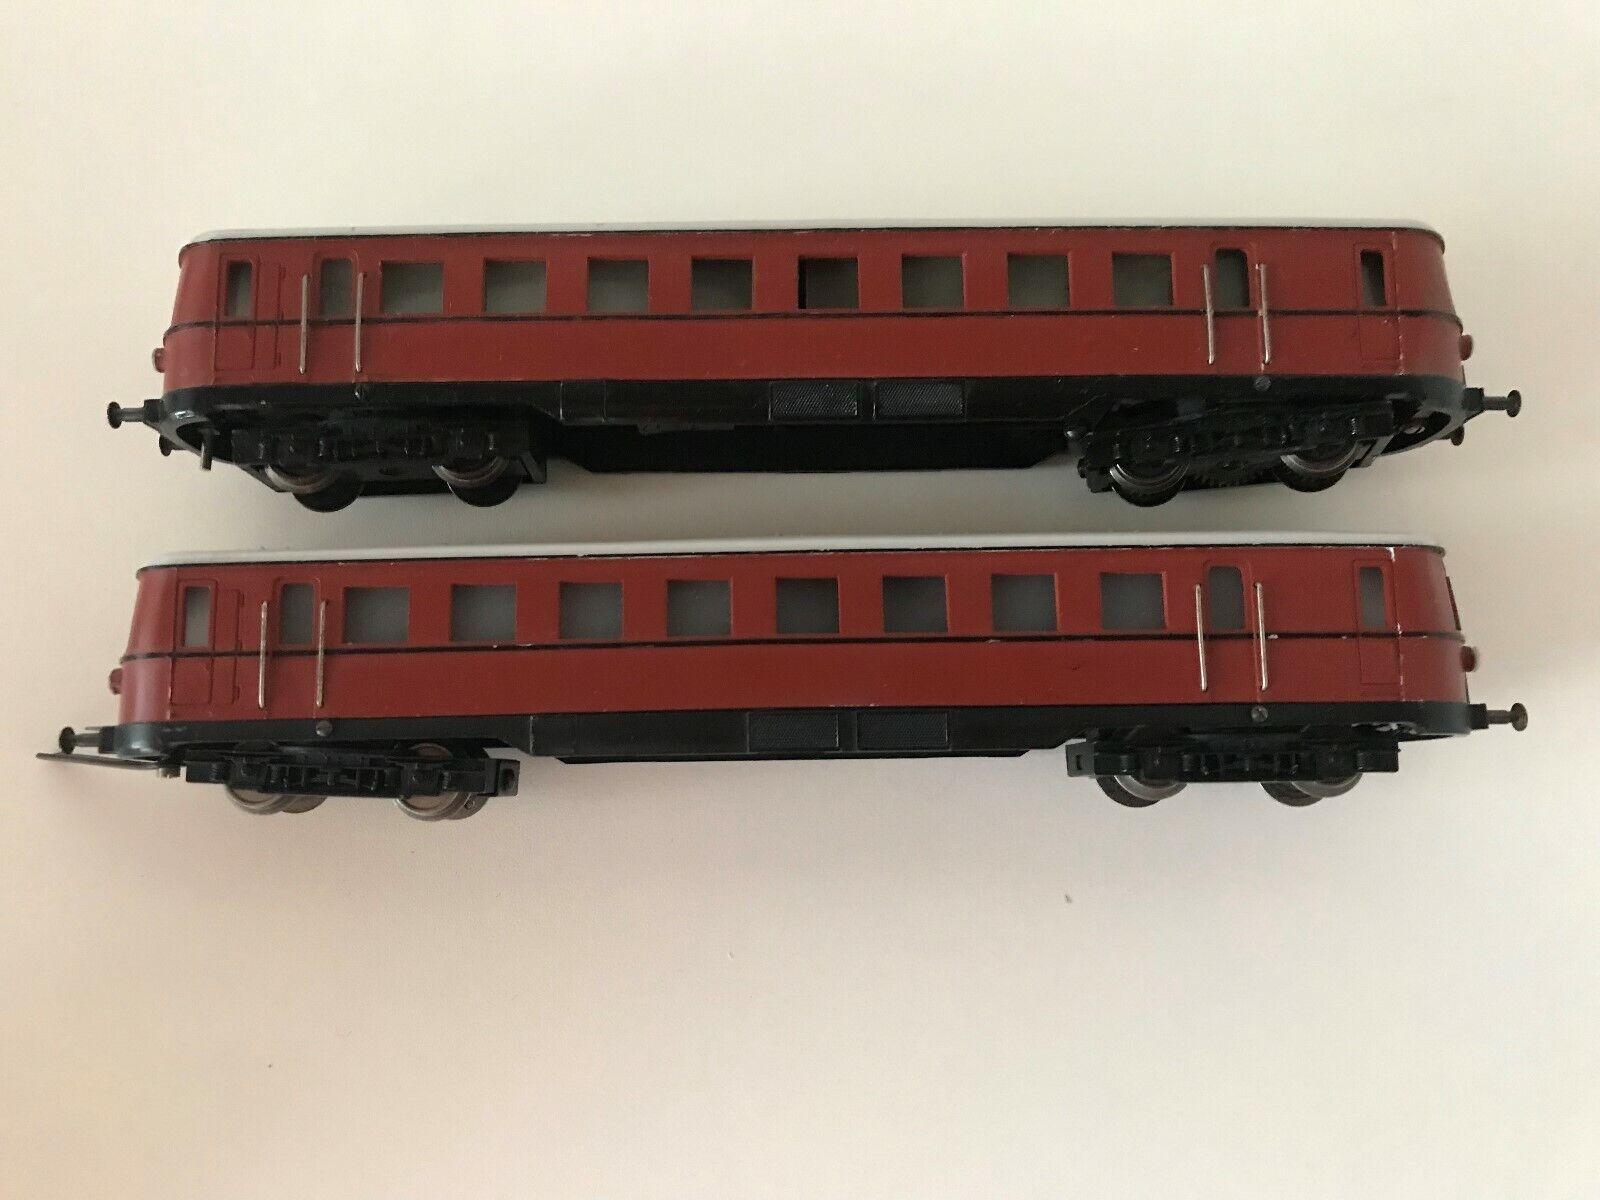 Fleischmann 1371 1b; dieselhydraul. doppeltriebwagen SJ, marrón, Top